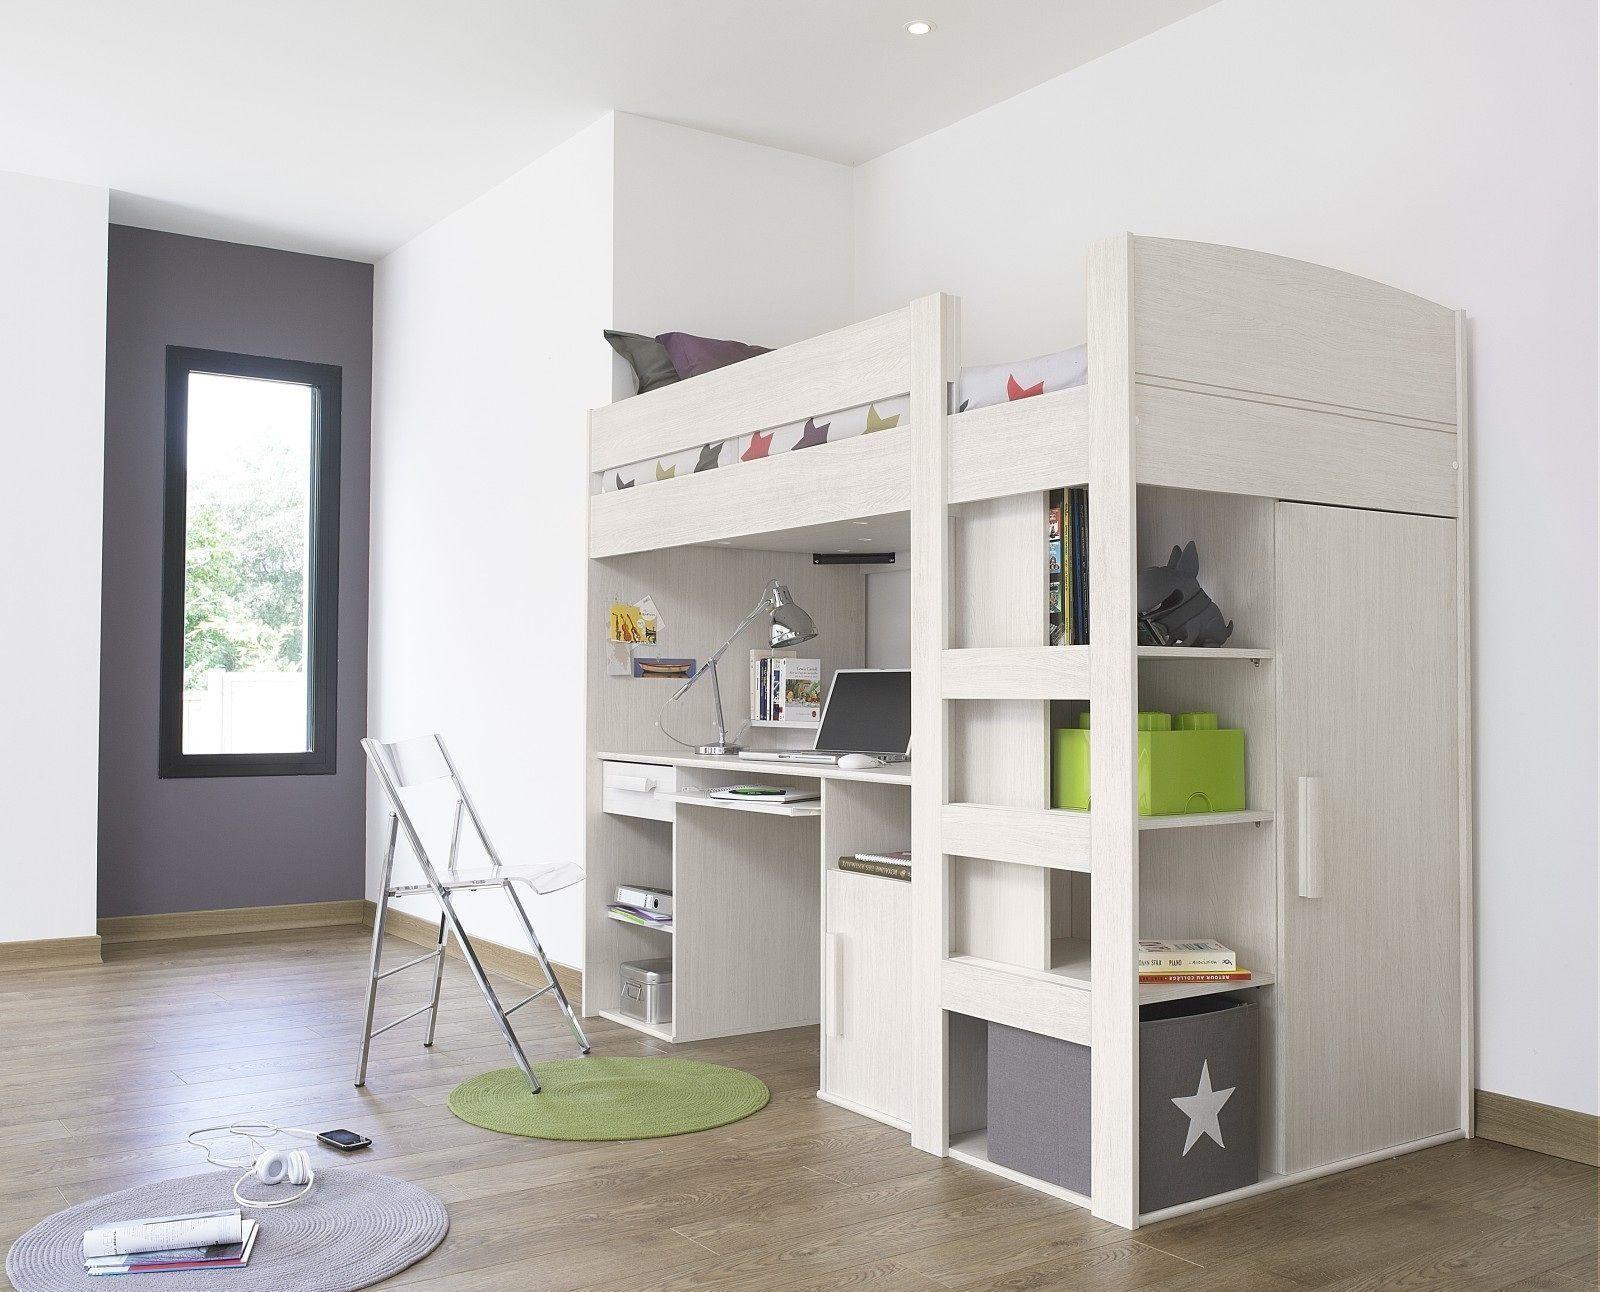 Modern loft bed ideas   Modern Bunk Bed with Desk  Master Bedroom Interior Design Ideas